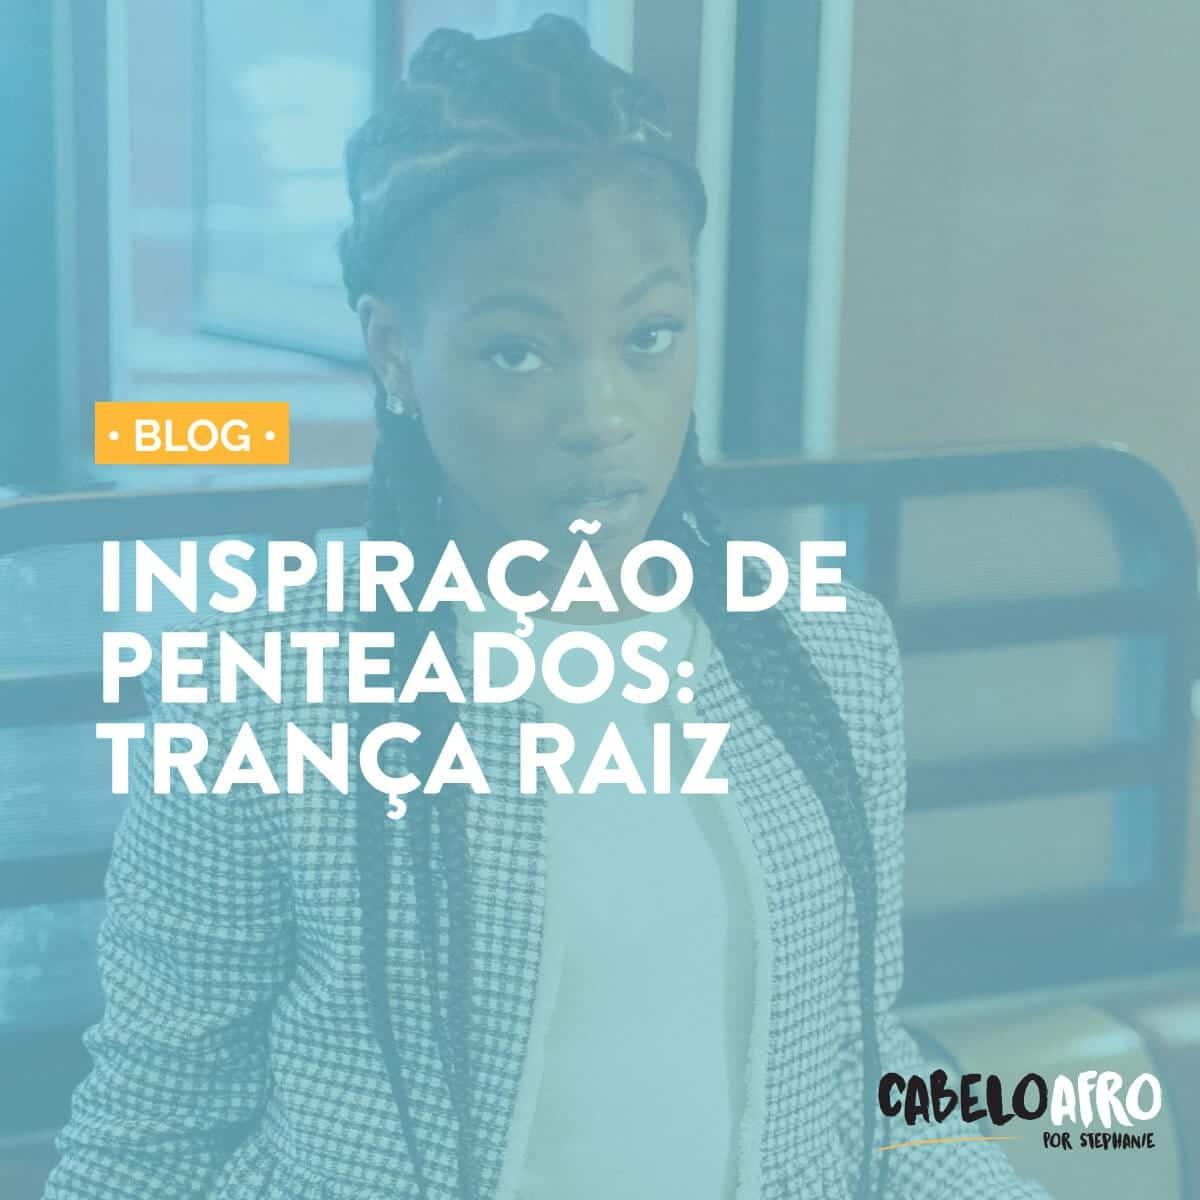 TRANÇA RAIZ